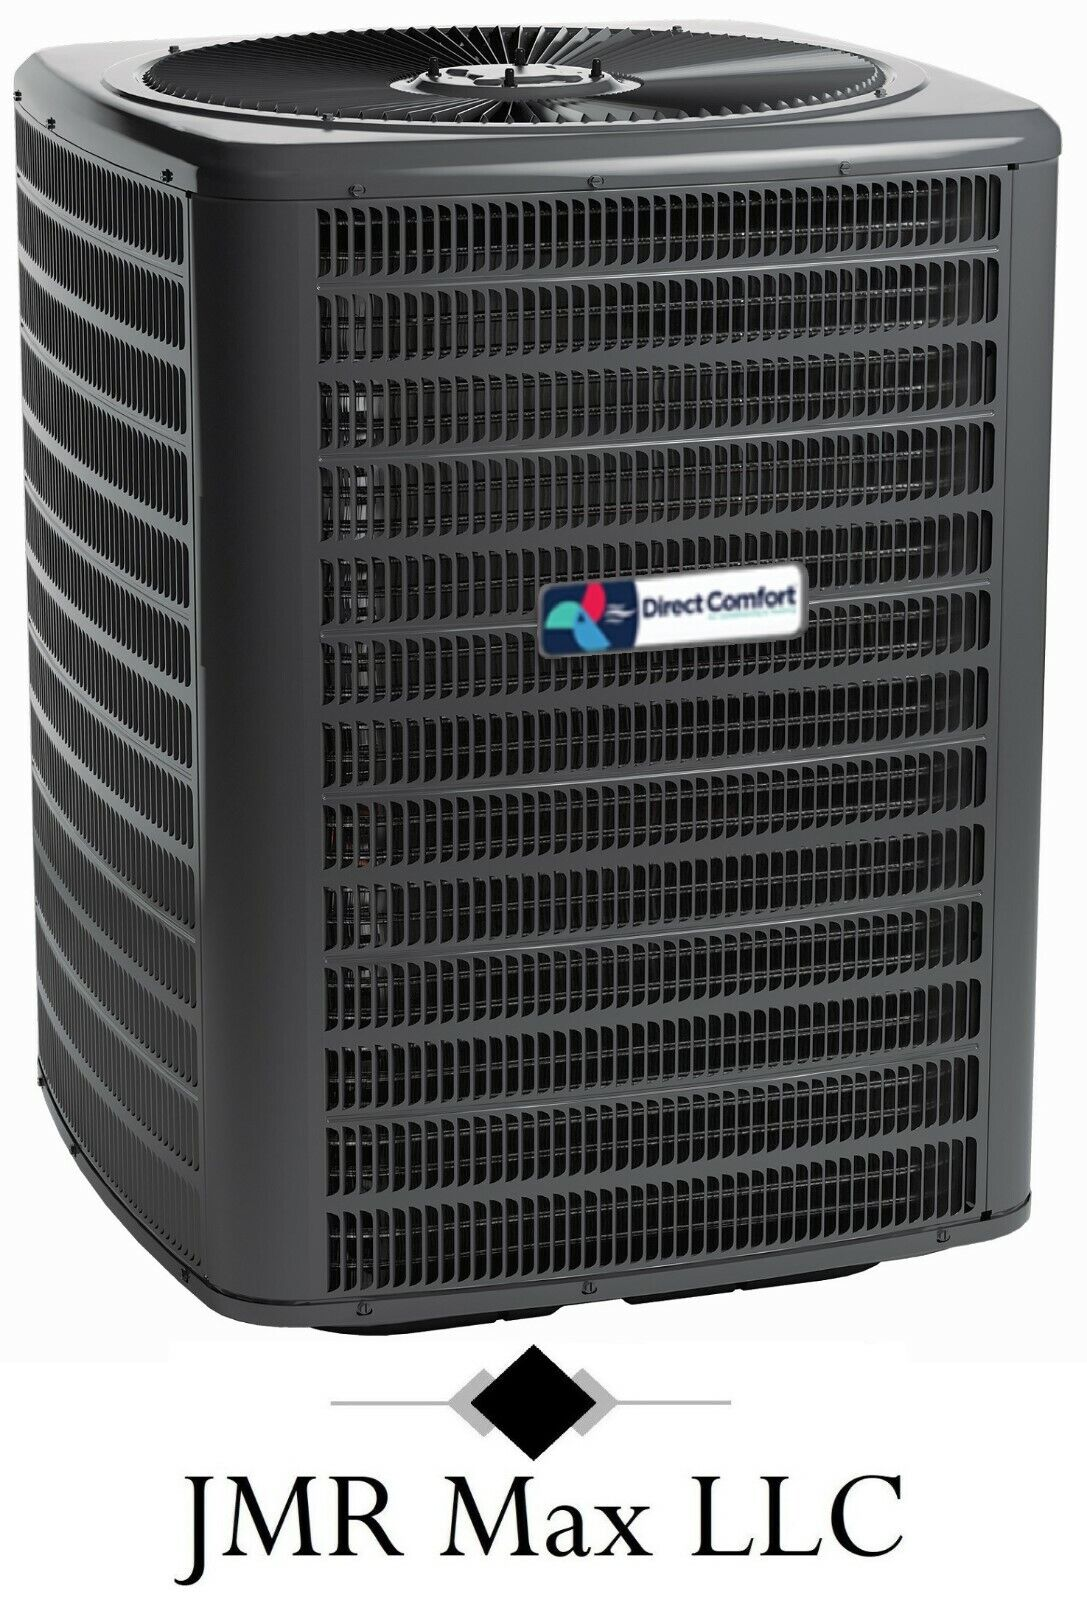 DC-GSX160481 Air Conditioner Condenser 4 Ton - Performances